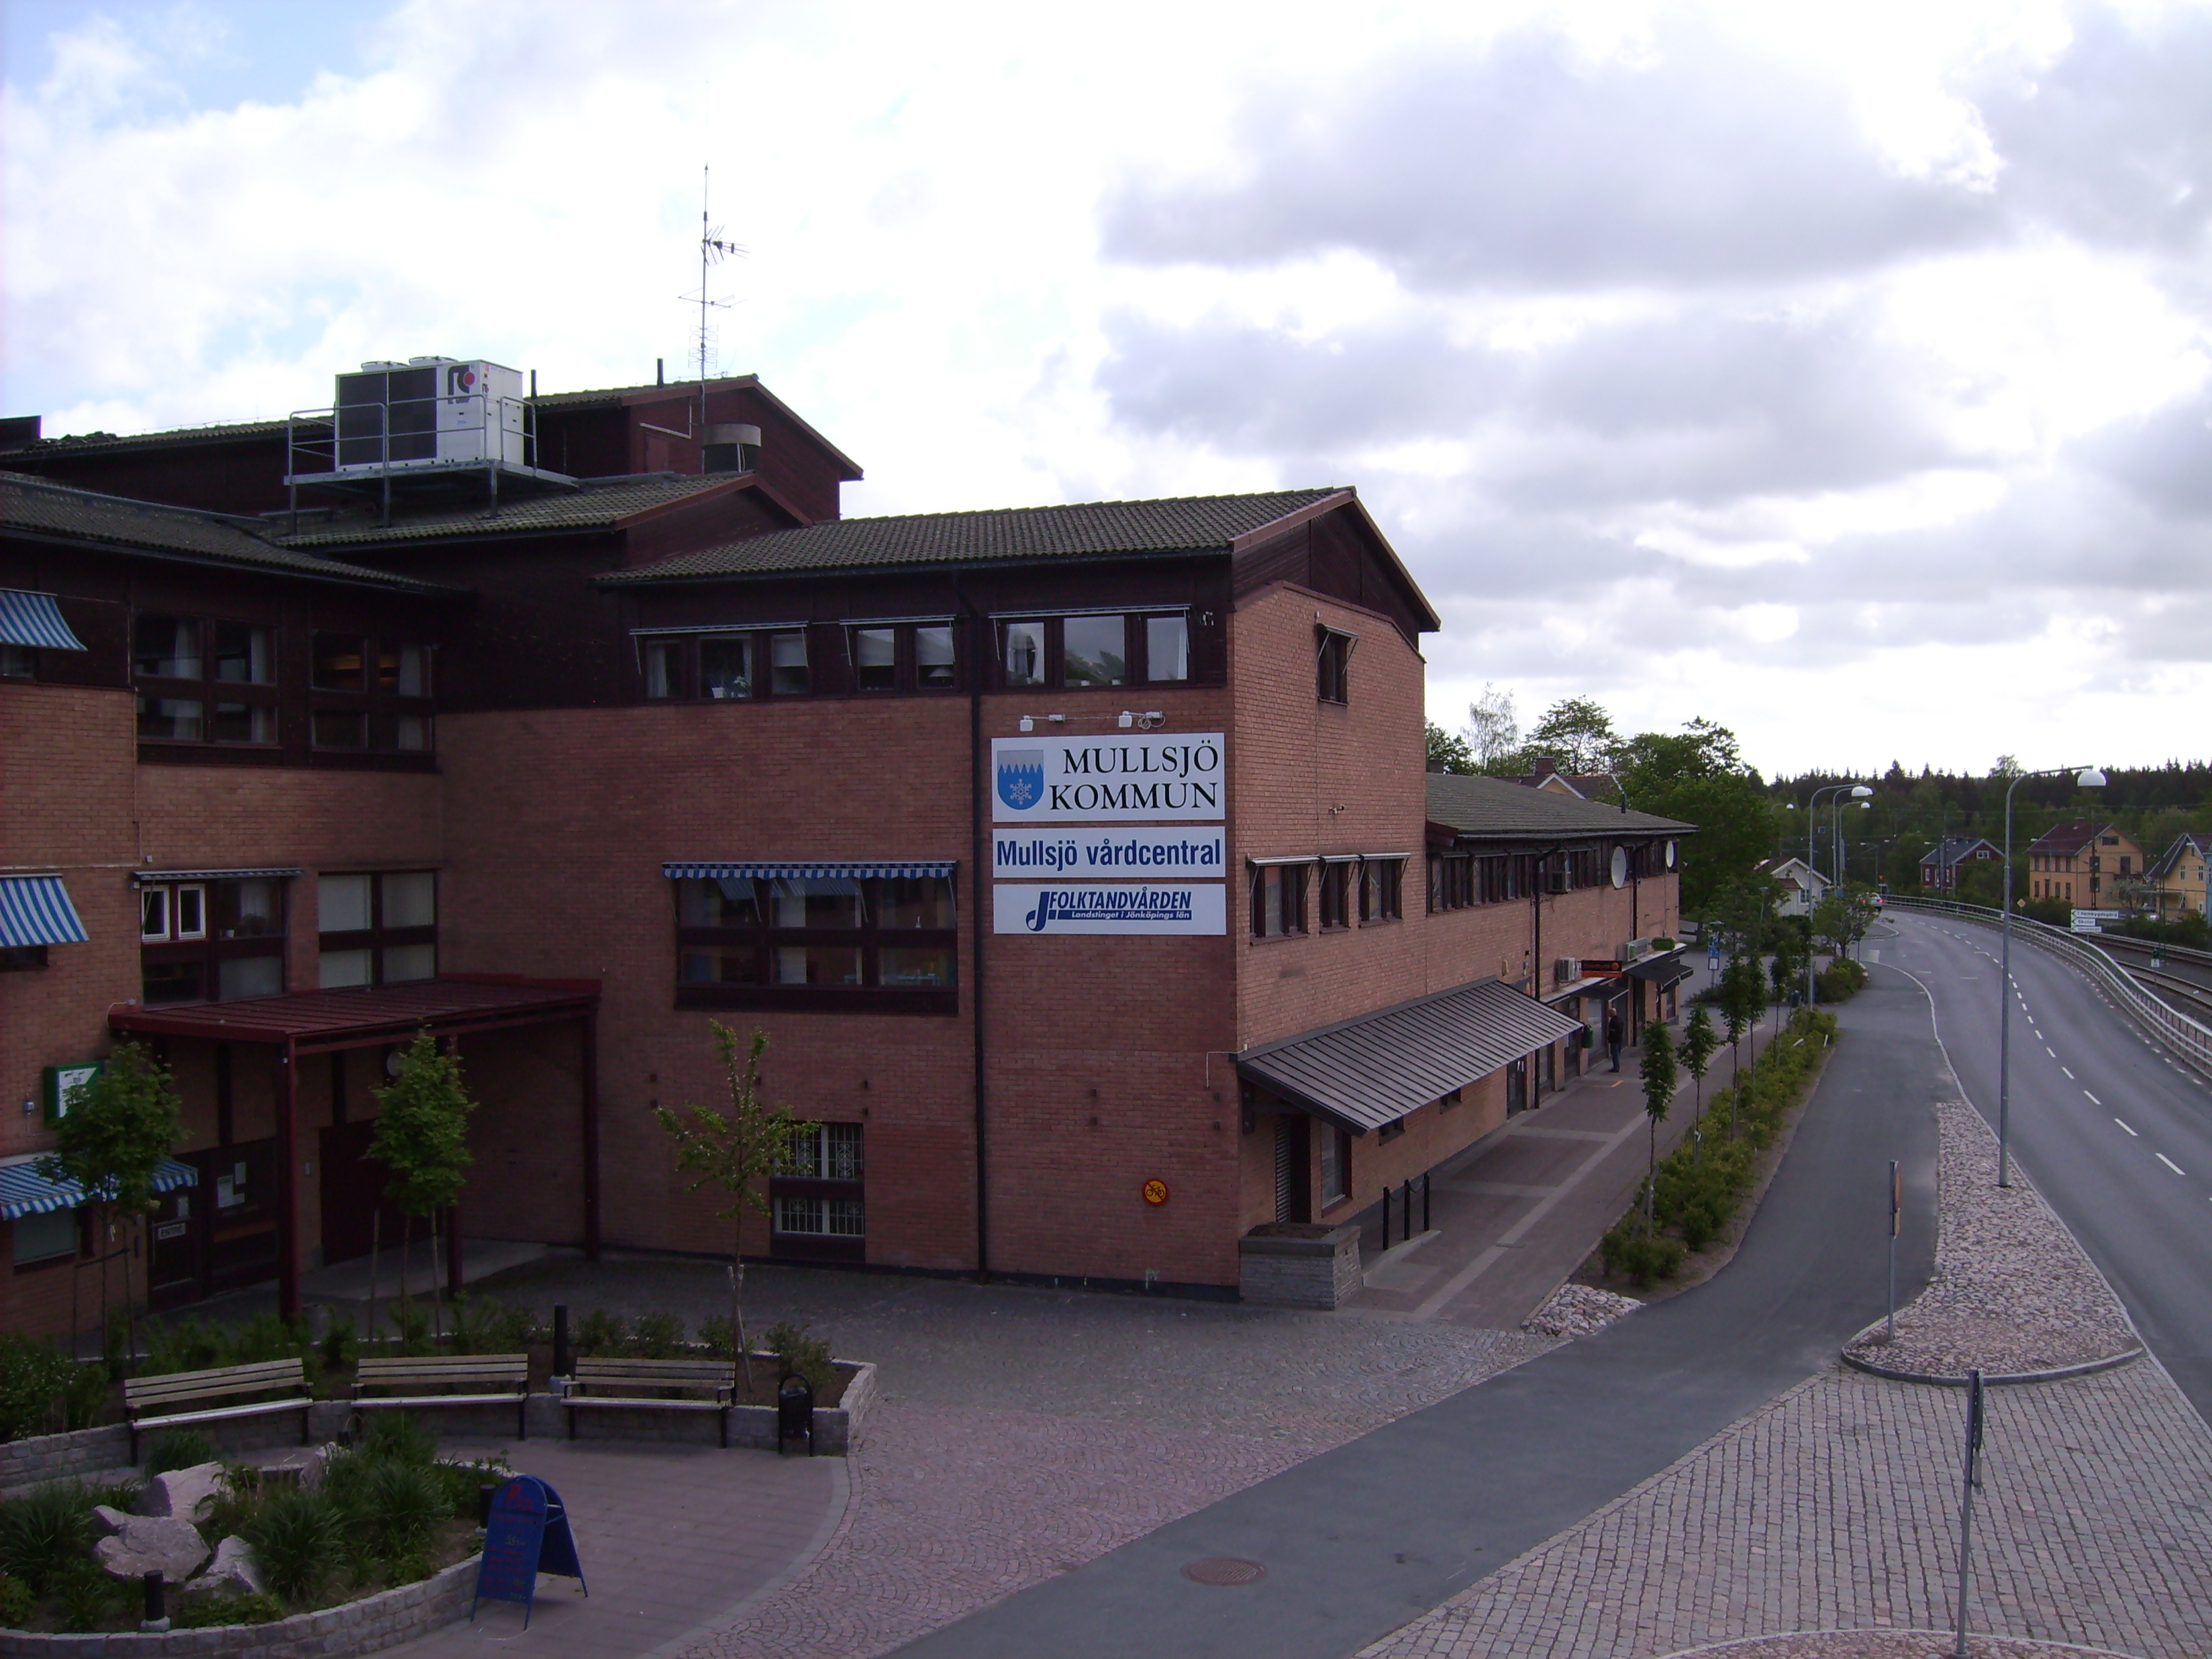 Free Mullsj, Sweden Events | Eventbrite